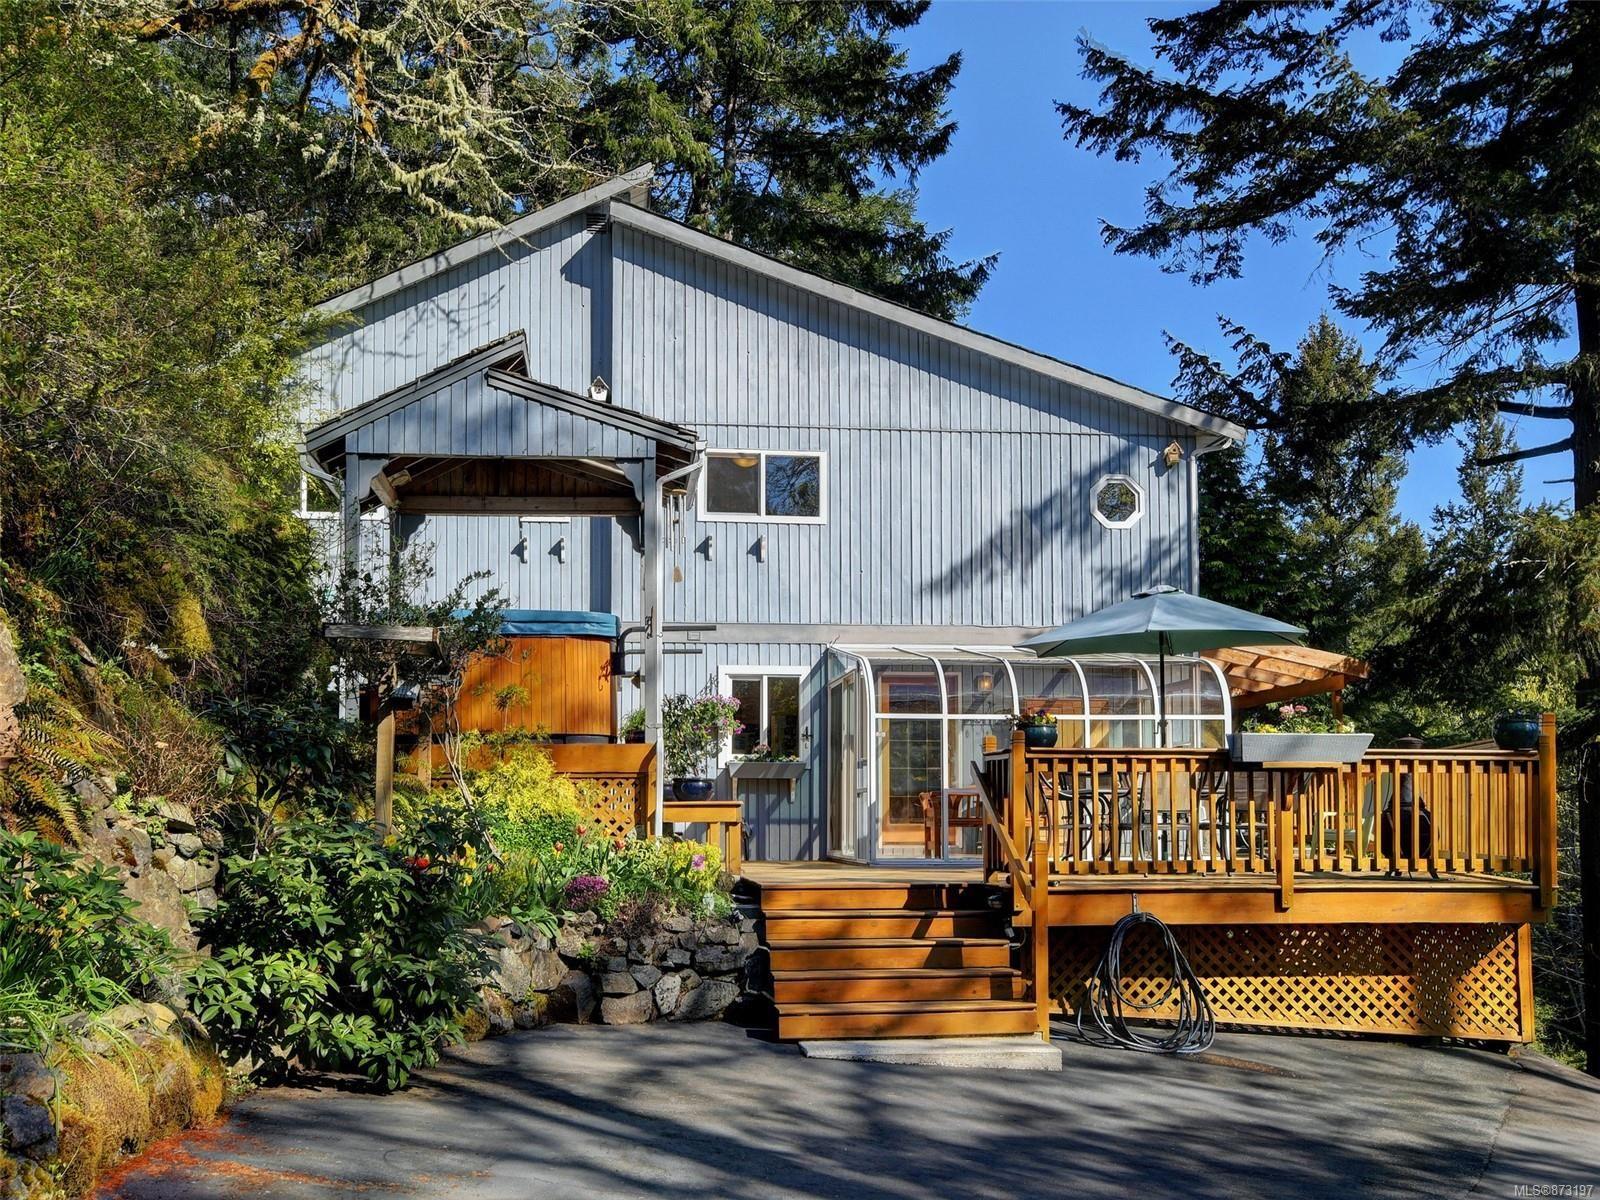 Main Photo: 1071 Brookview Dr in : Me Metchosin House for sale (Metchosin)  : MLS®# 873197